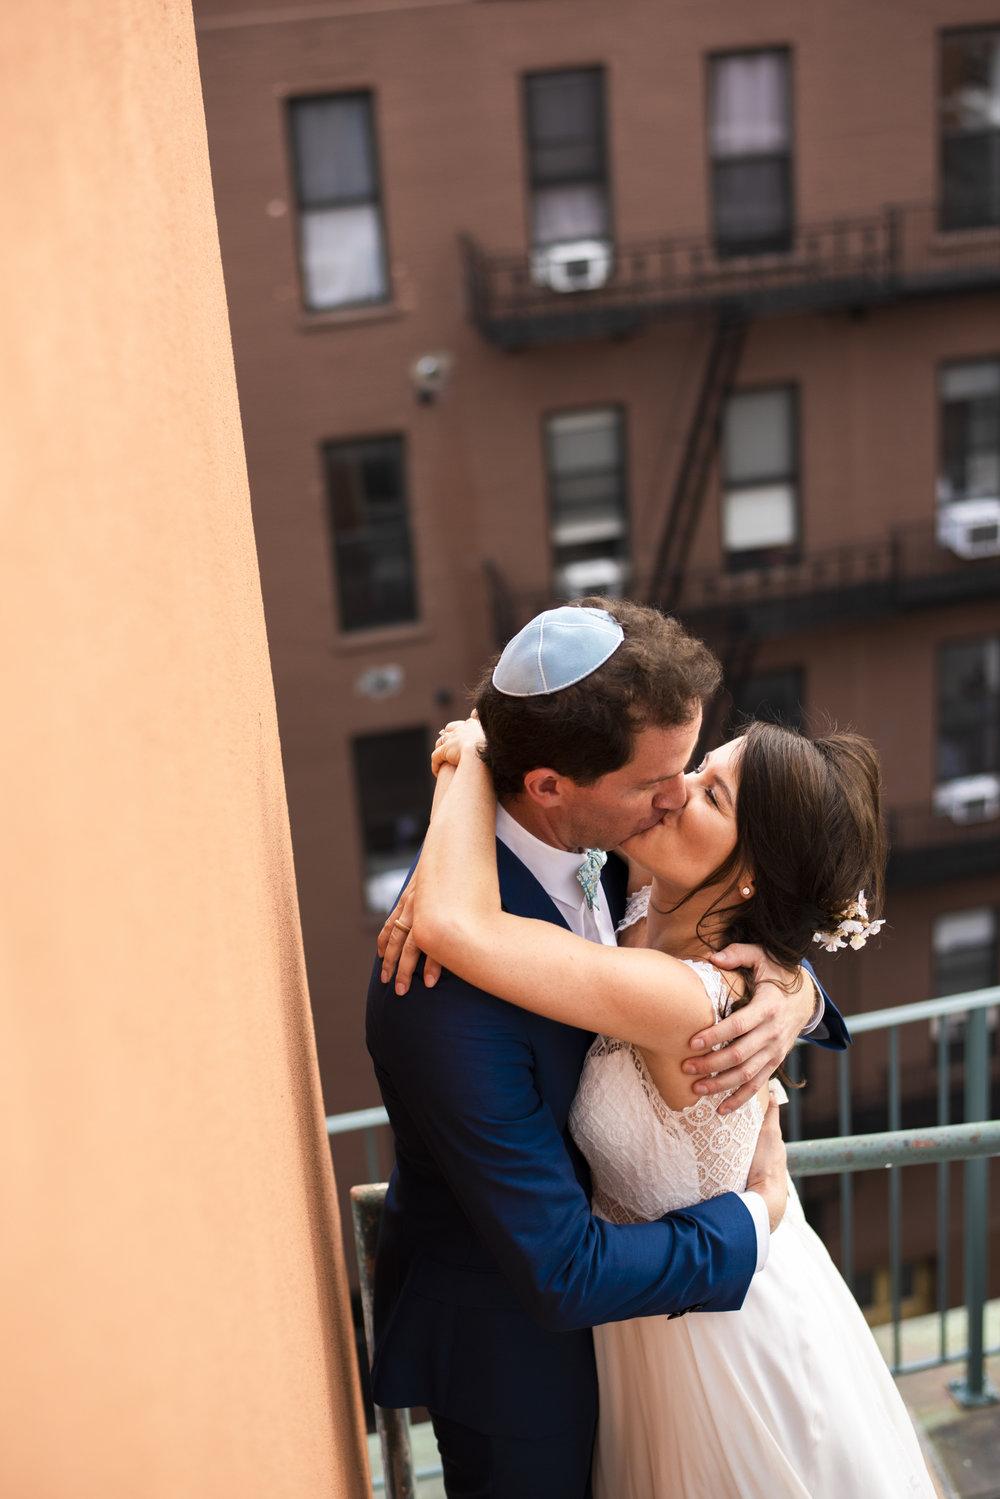 Keren & Jonathan's Wedding by Romina Hendlin-825.jpg